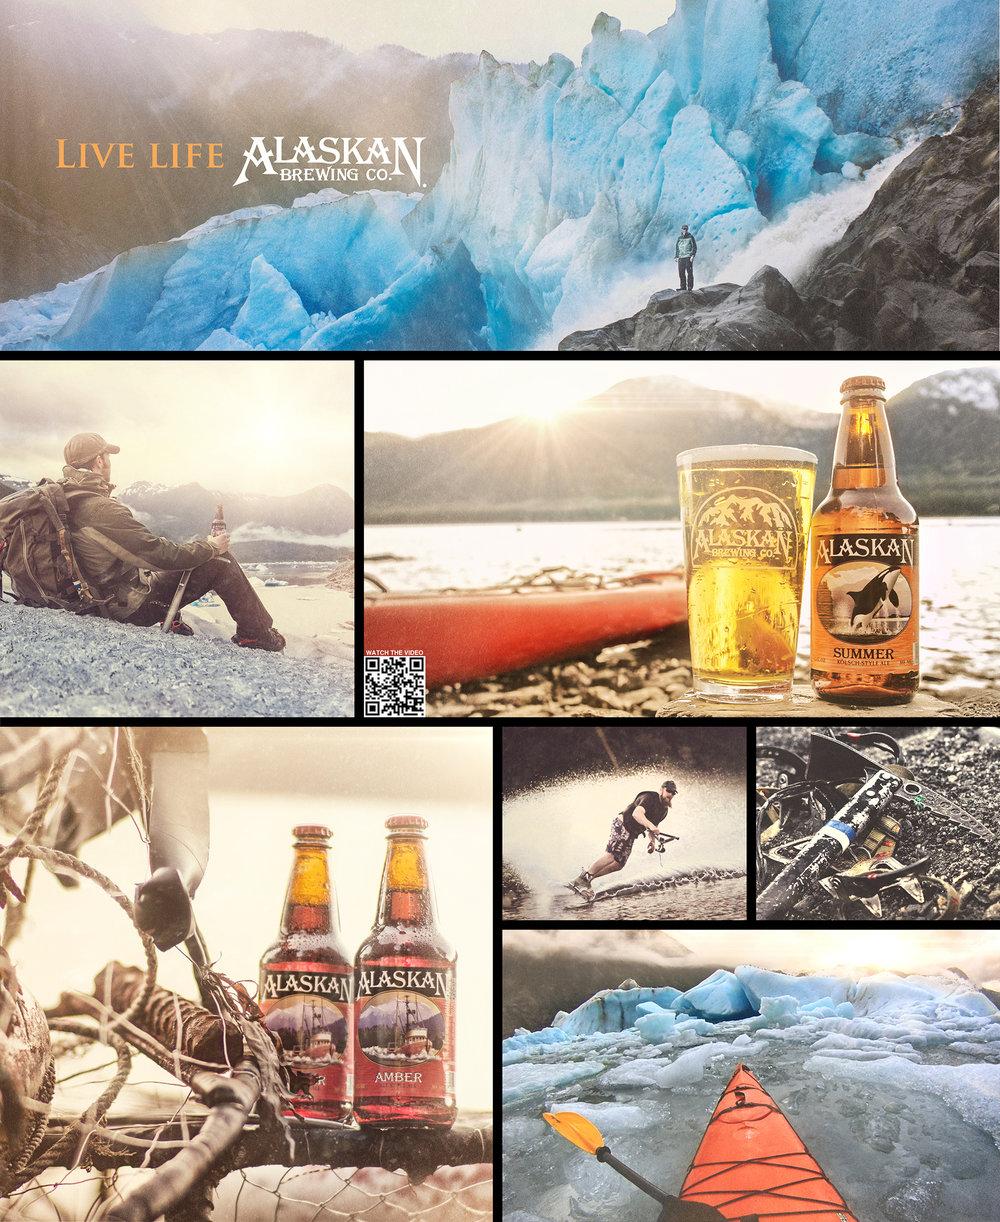 Redtail-AlaskanBC-Ads-010.jpg